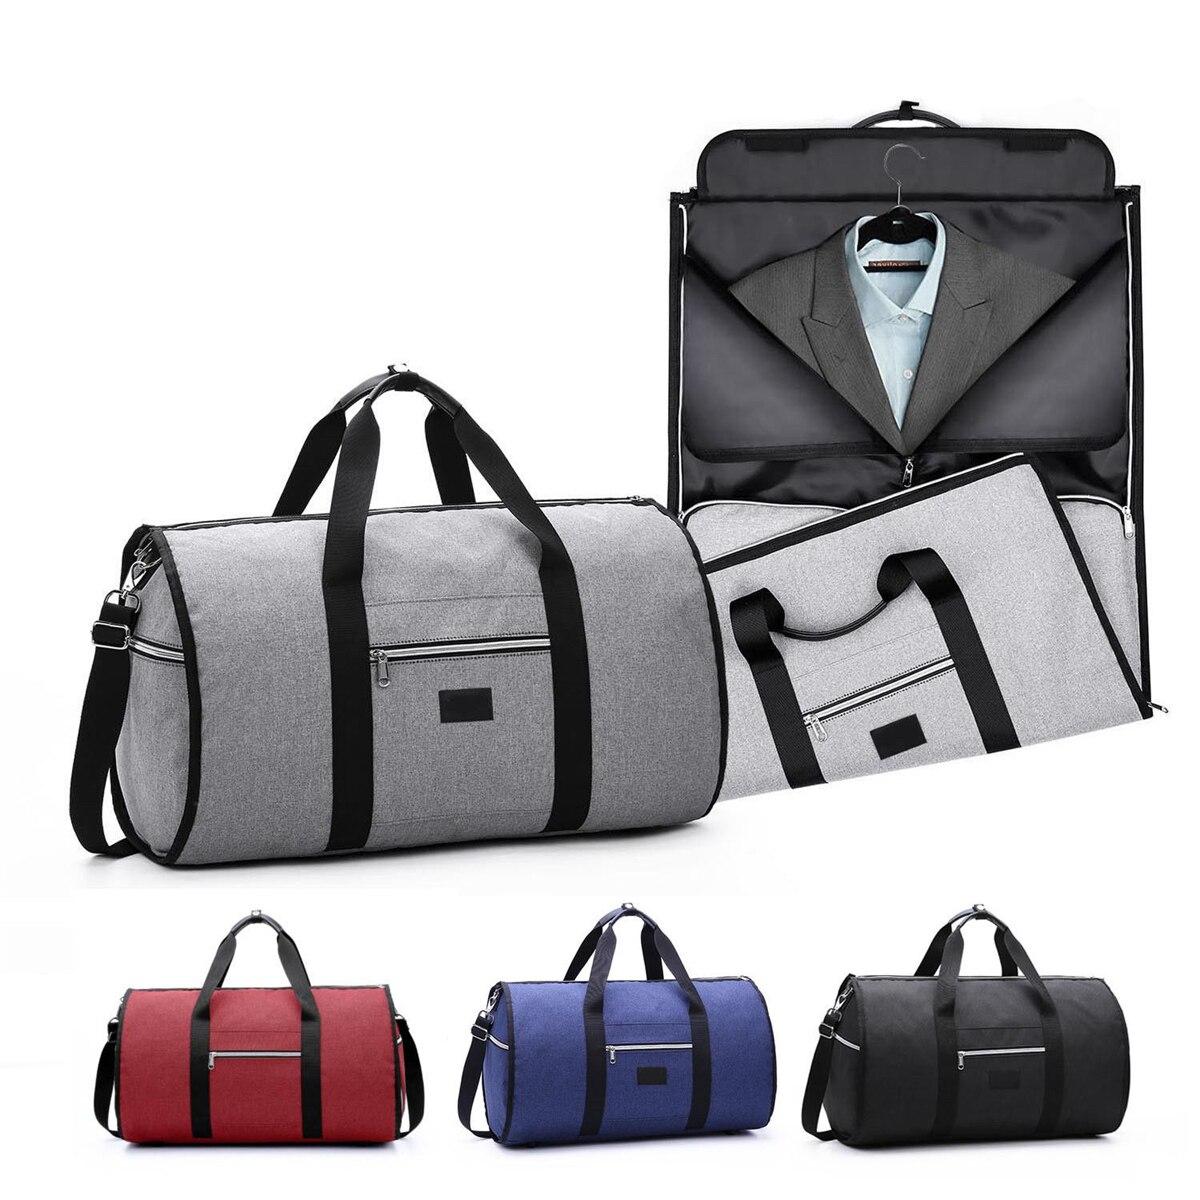 Bolsa de viaje impermeable para bolsas de ropa de las mujeres de viaje bolsa 2 en 1 equipaje bolsa de bolsas en ocio bolso de mano